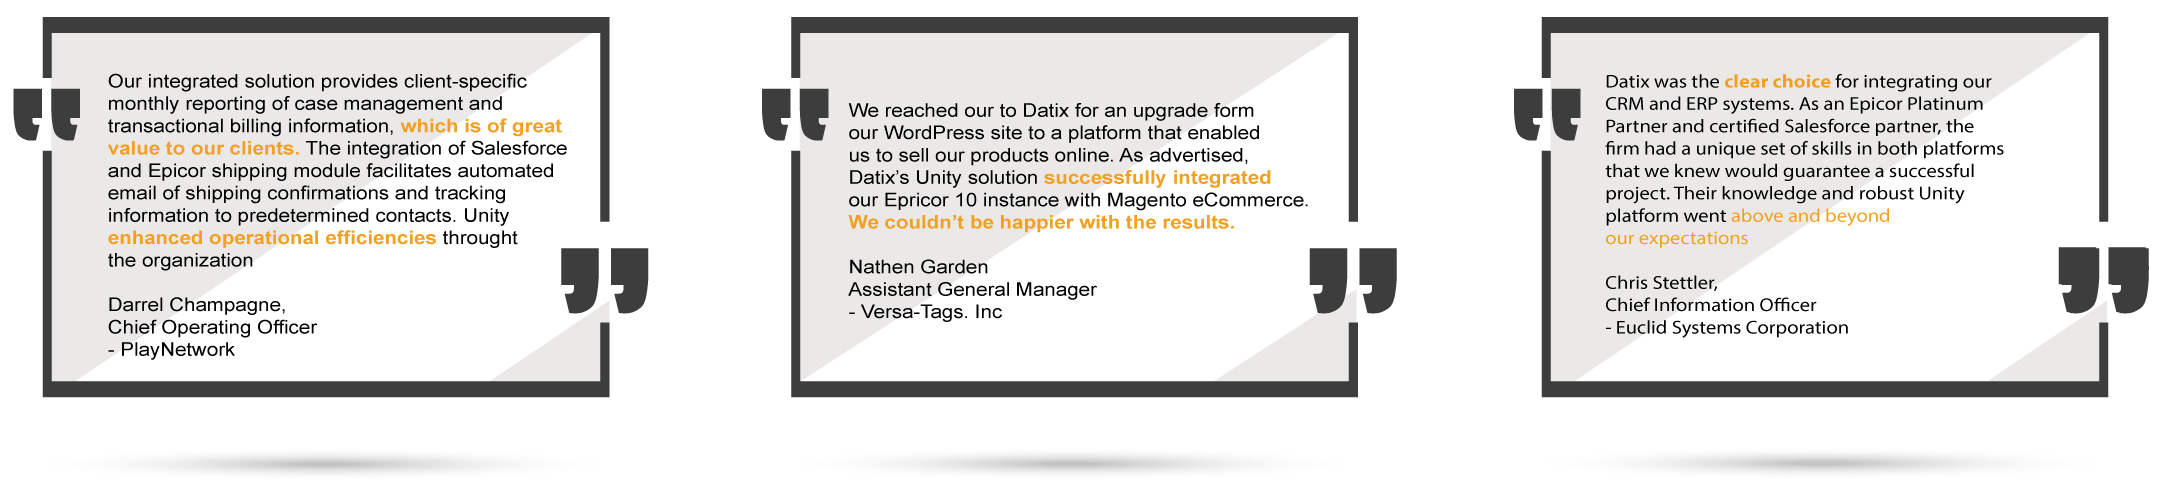 Unity Integration Client Testimony